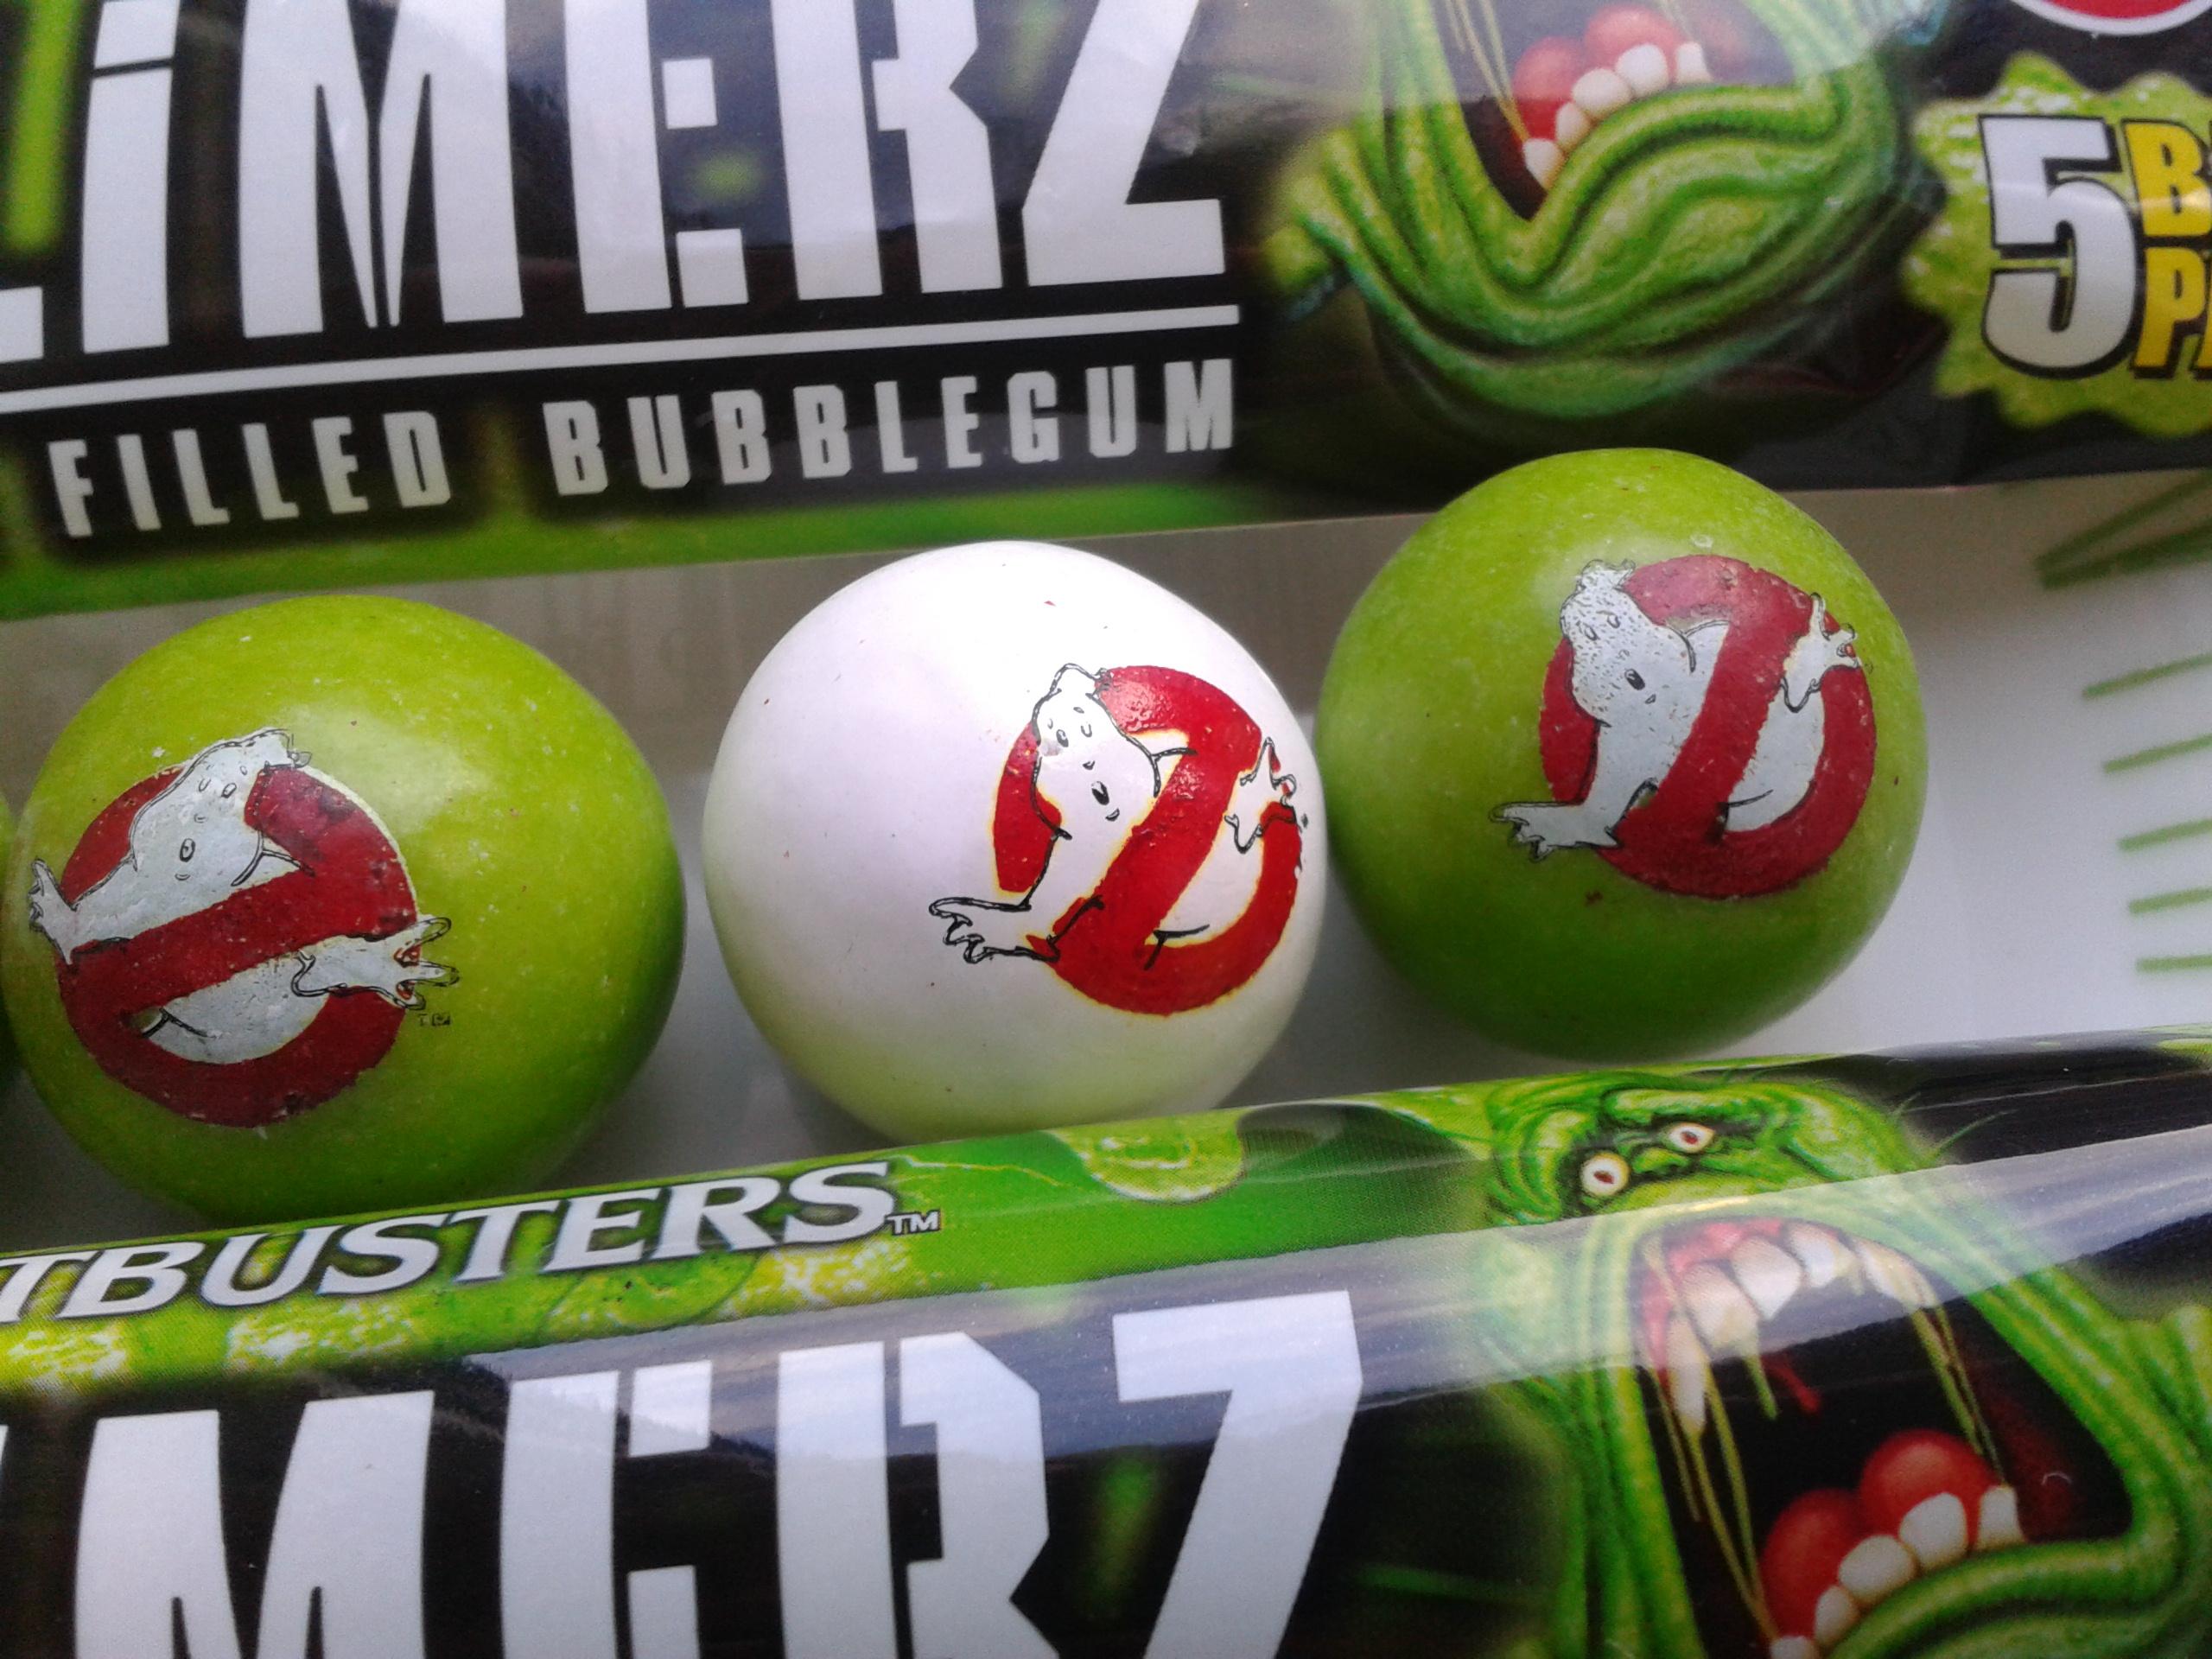 Ghostbusters Slimerz Gumballs - 2015 Release